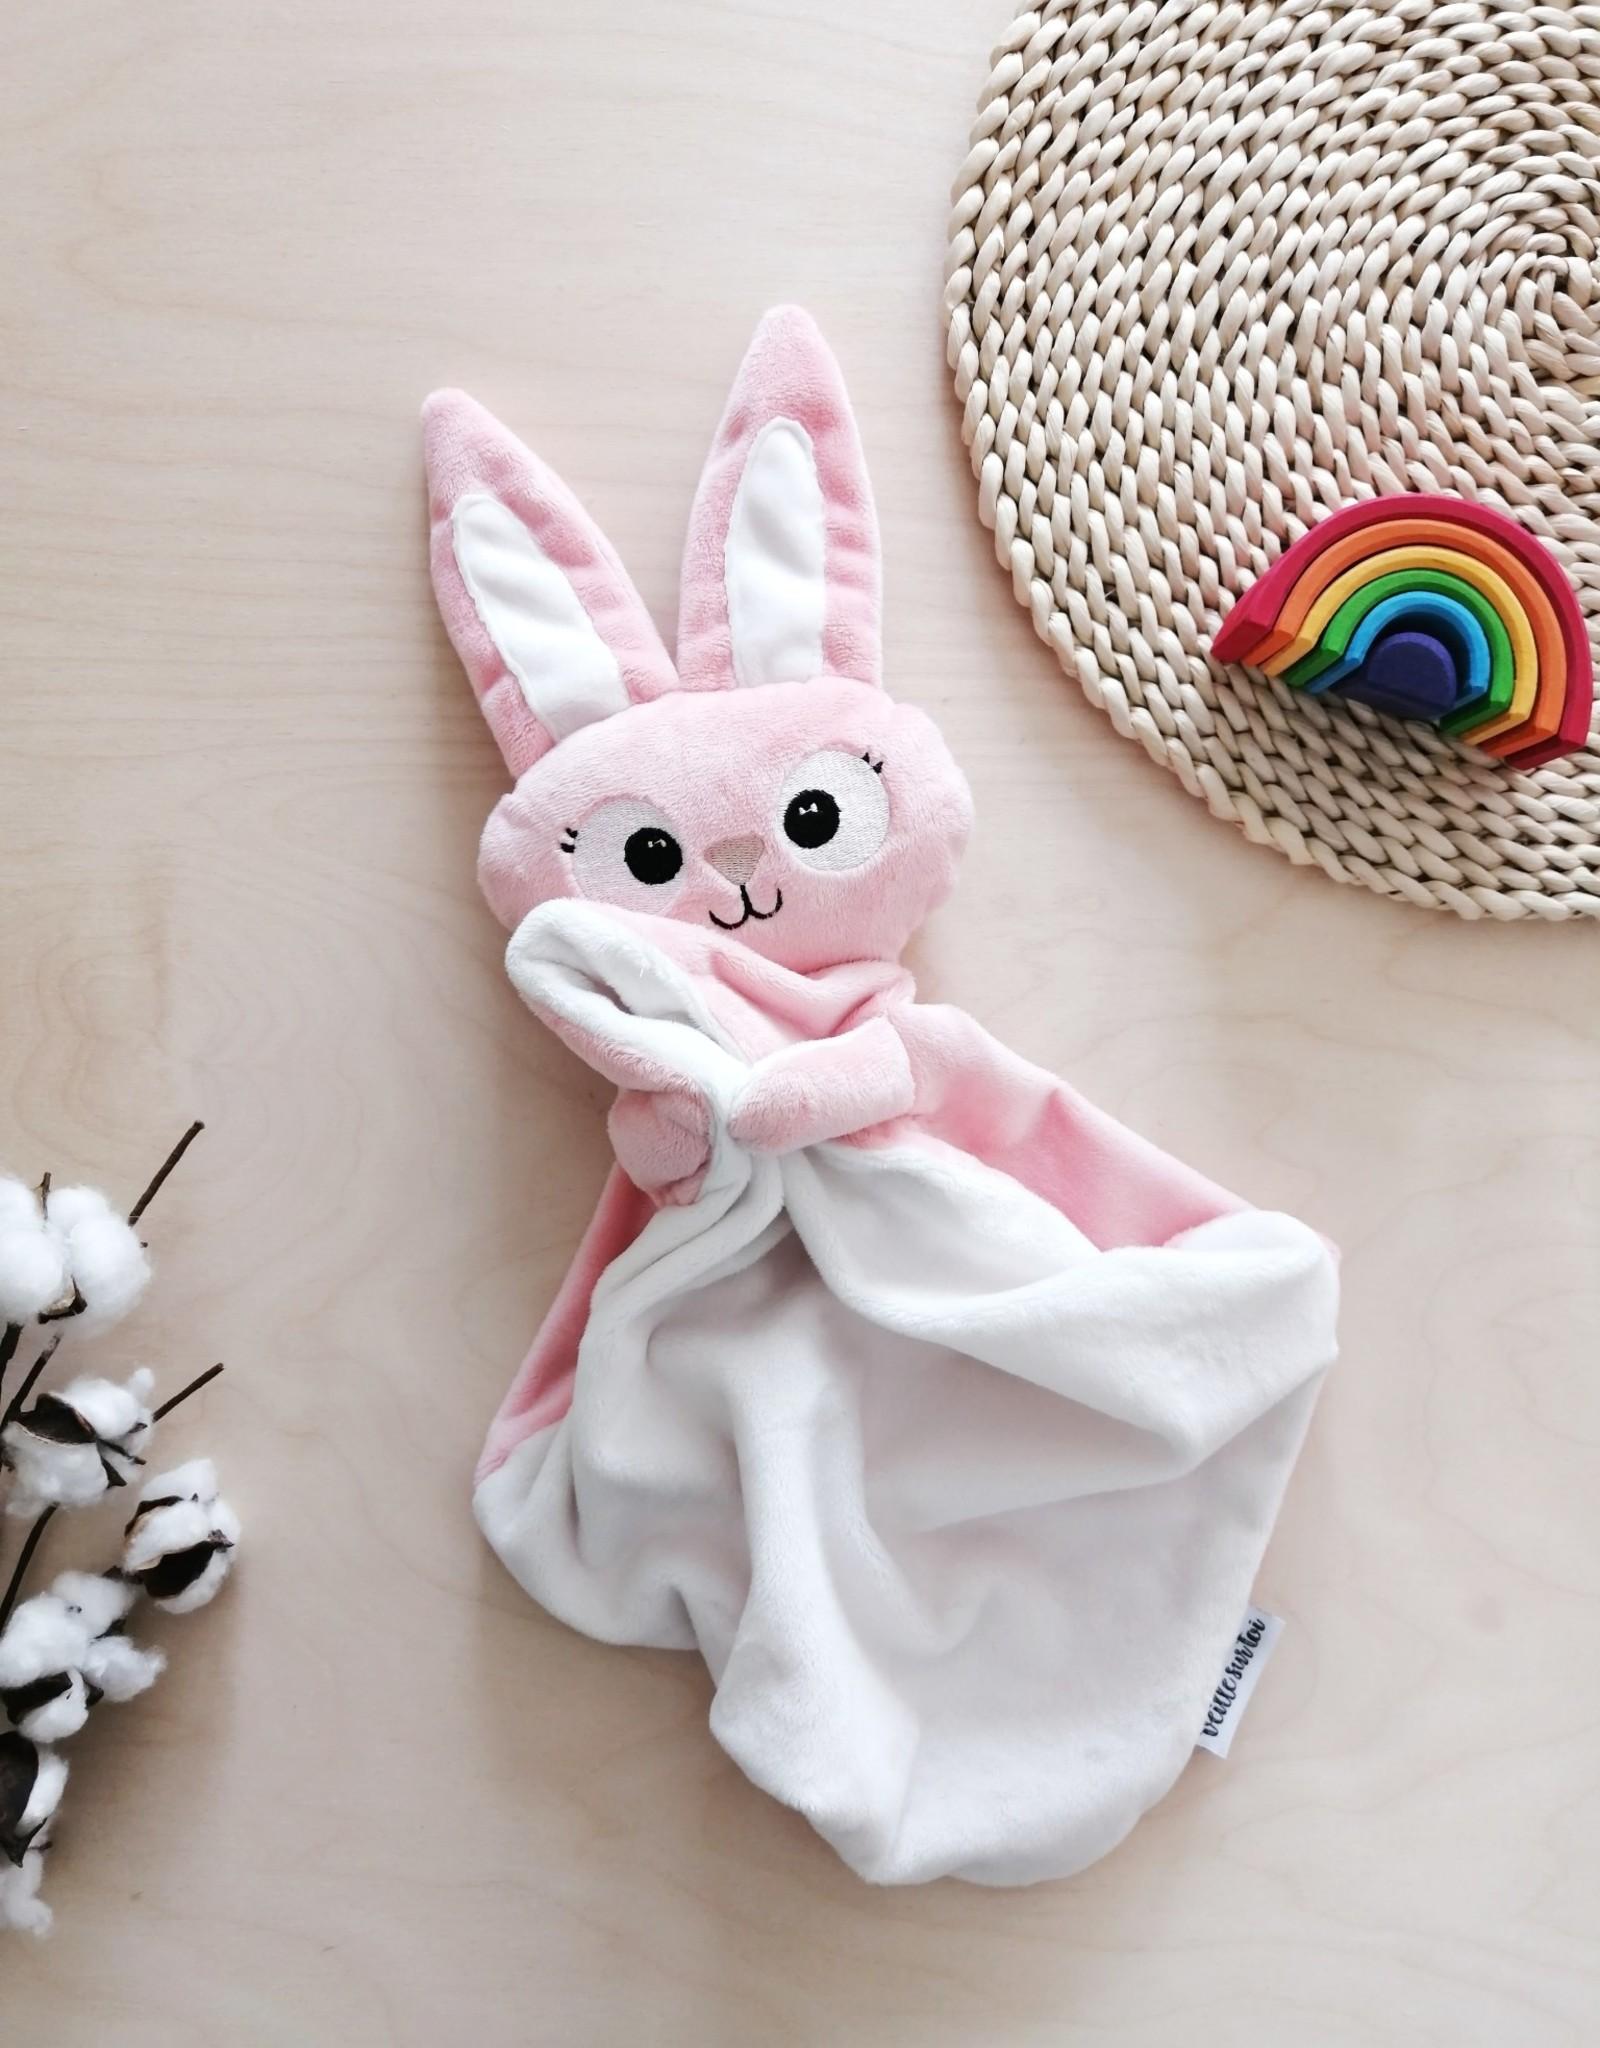 Veille sur toi Baby Blankie - Margot the pink bunny NEW - Pre-order